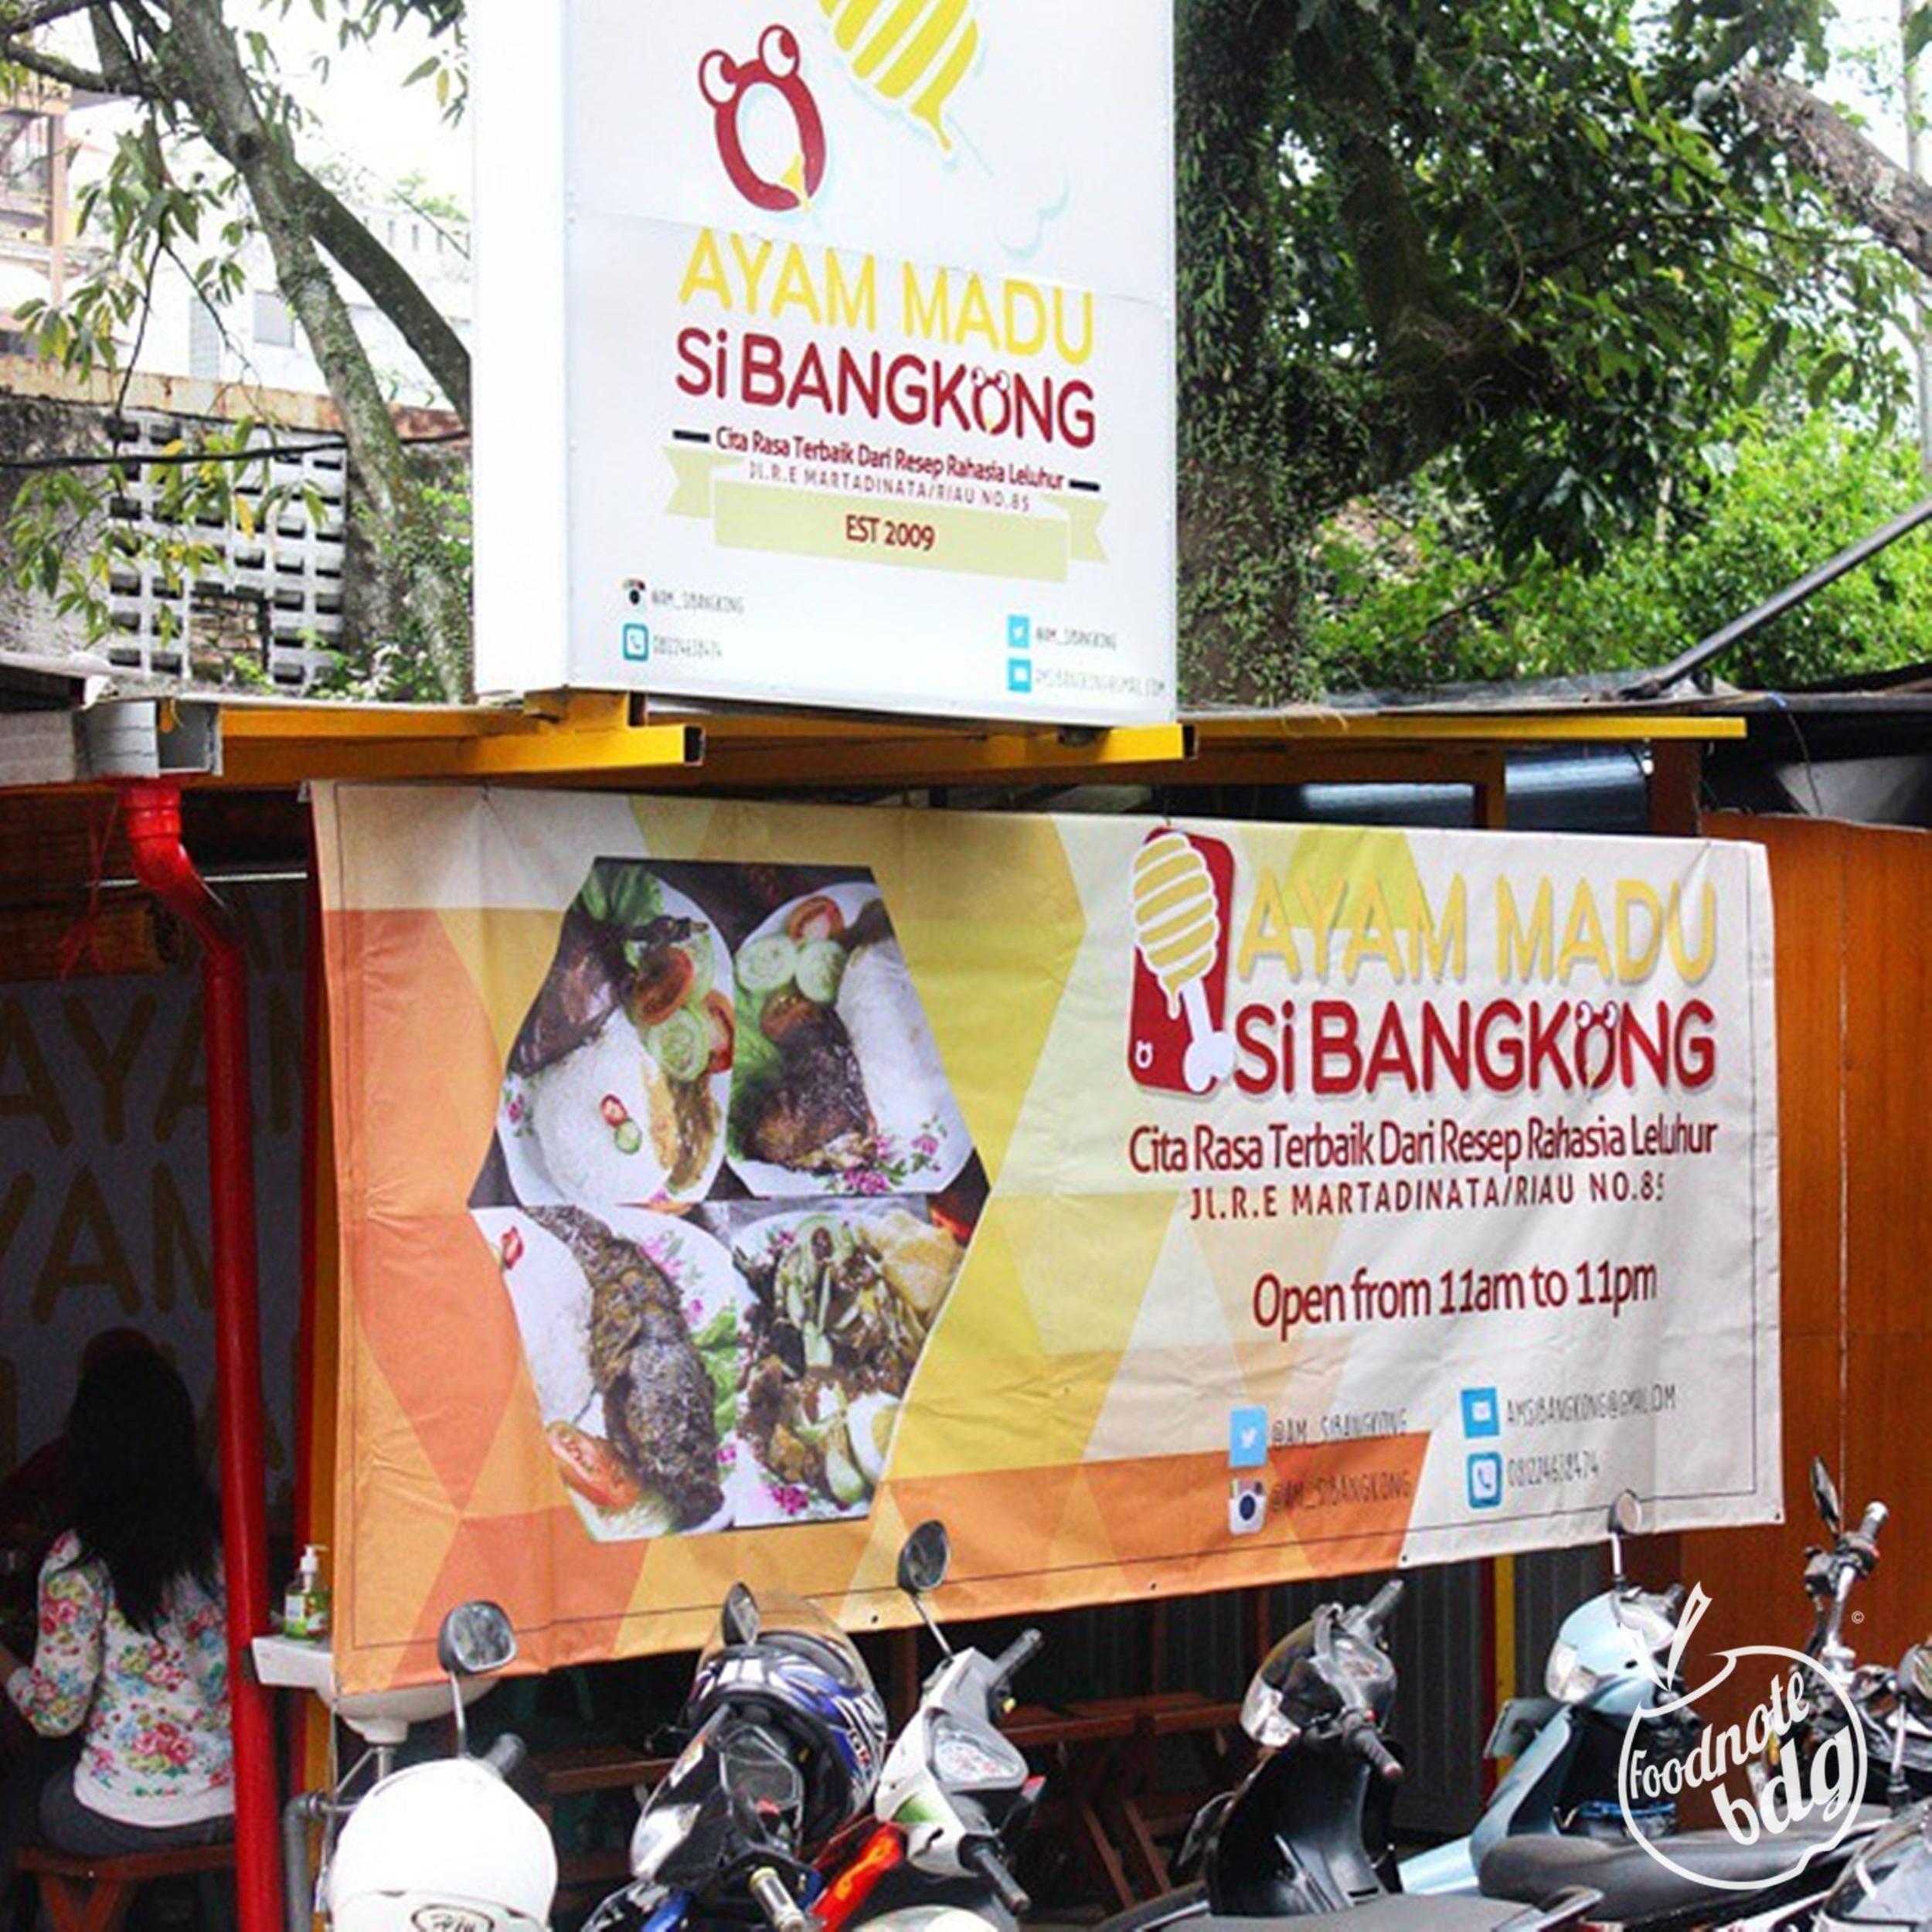 updated!* Ayam Madu Si Bangkong : Resep Leluhur Favorit Mahasiswa sampai  Alumni! – Foodnote Stories